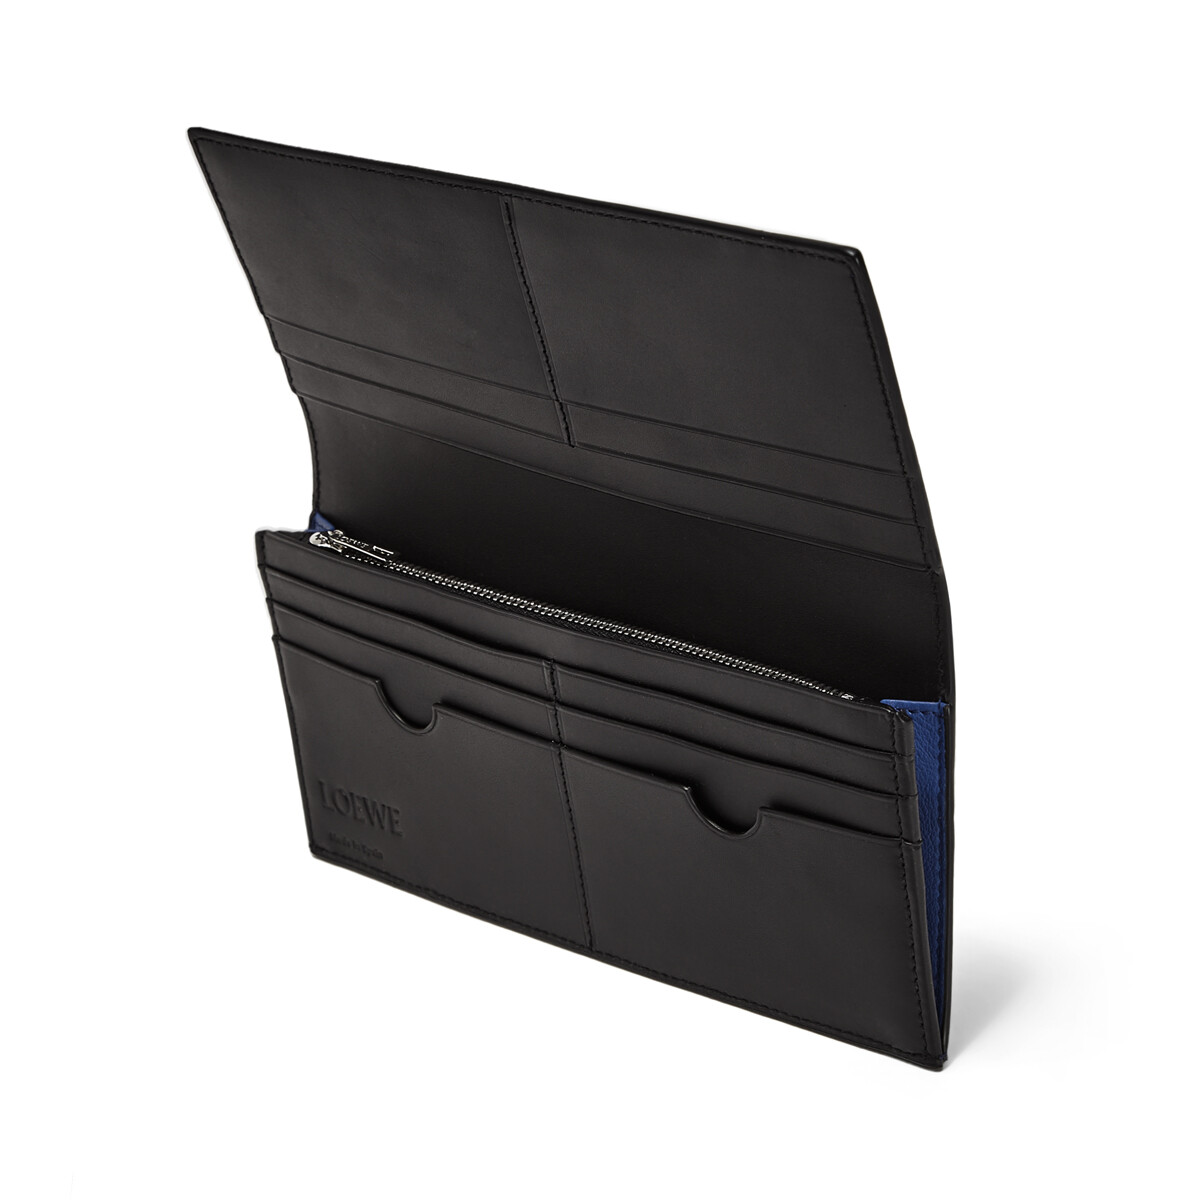 LOEWE Puzzle Long Horizontal Wallet Pacific Blue/Seaside Blue front